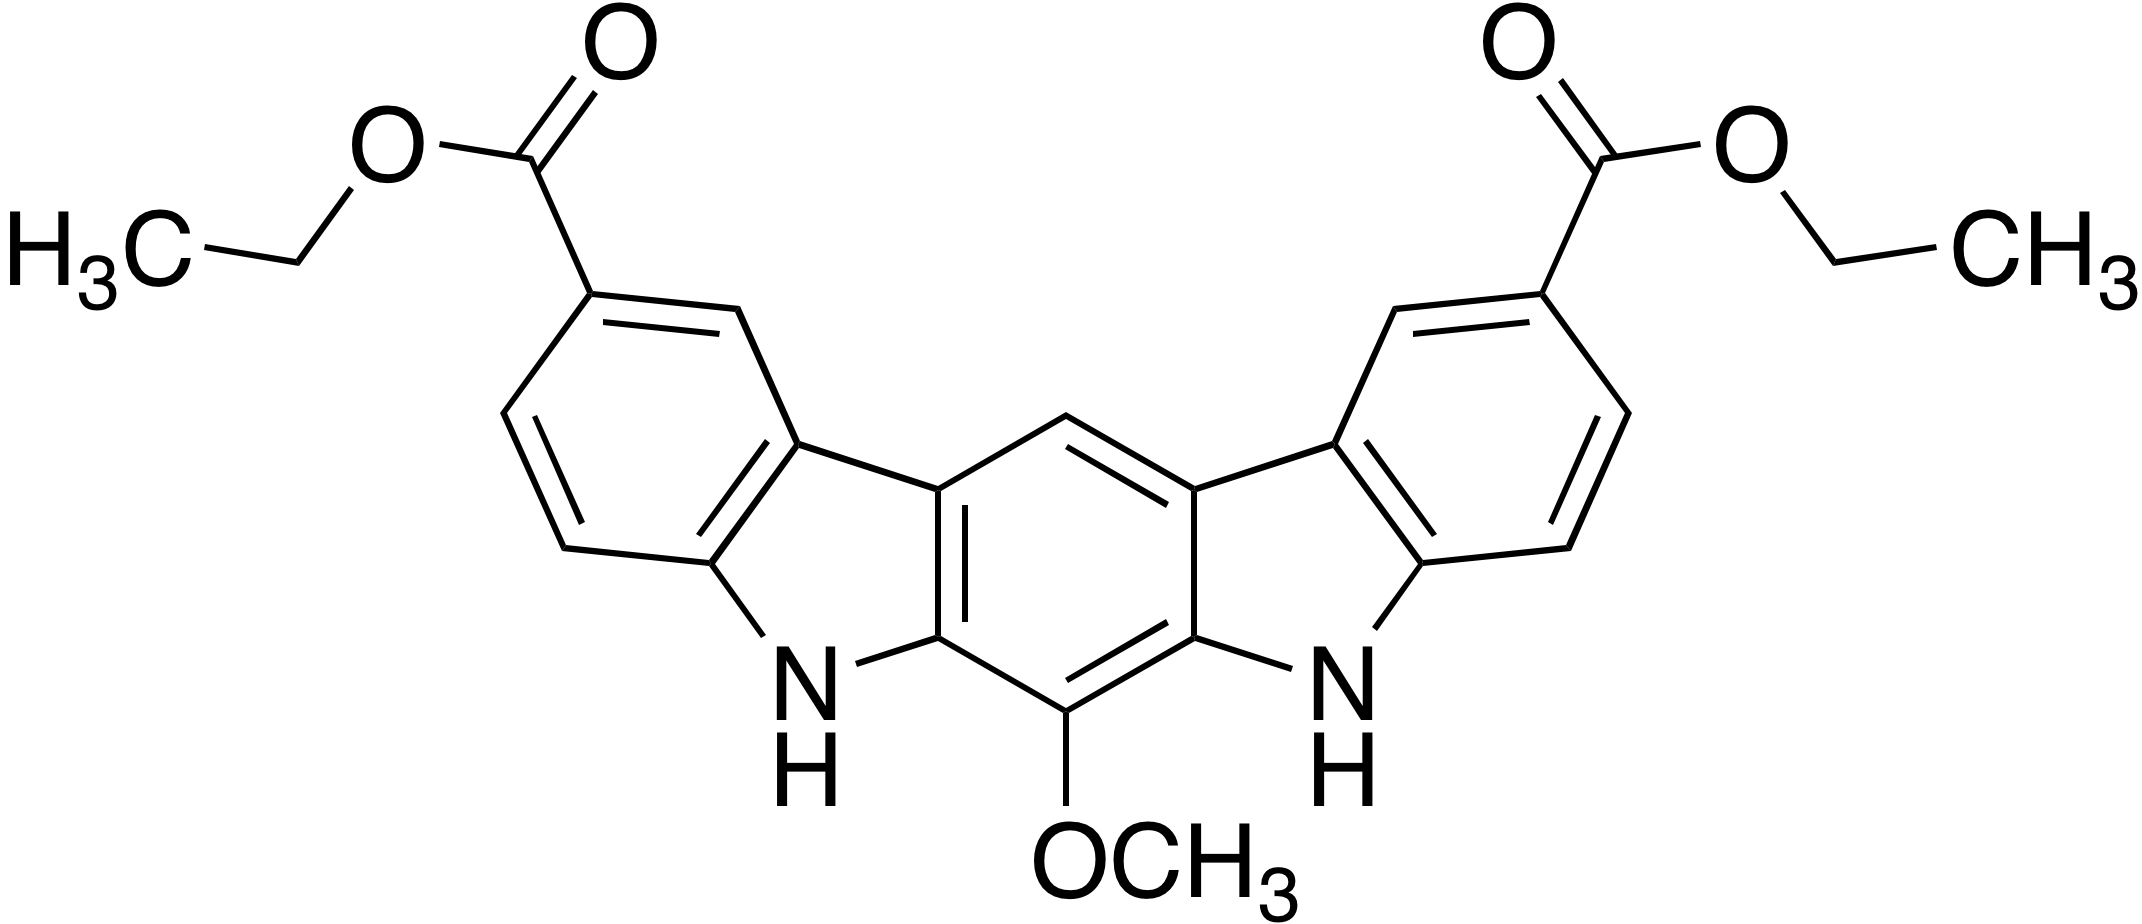 SR 13668